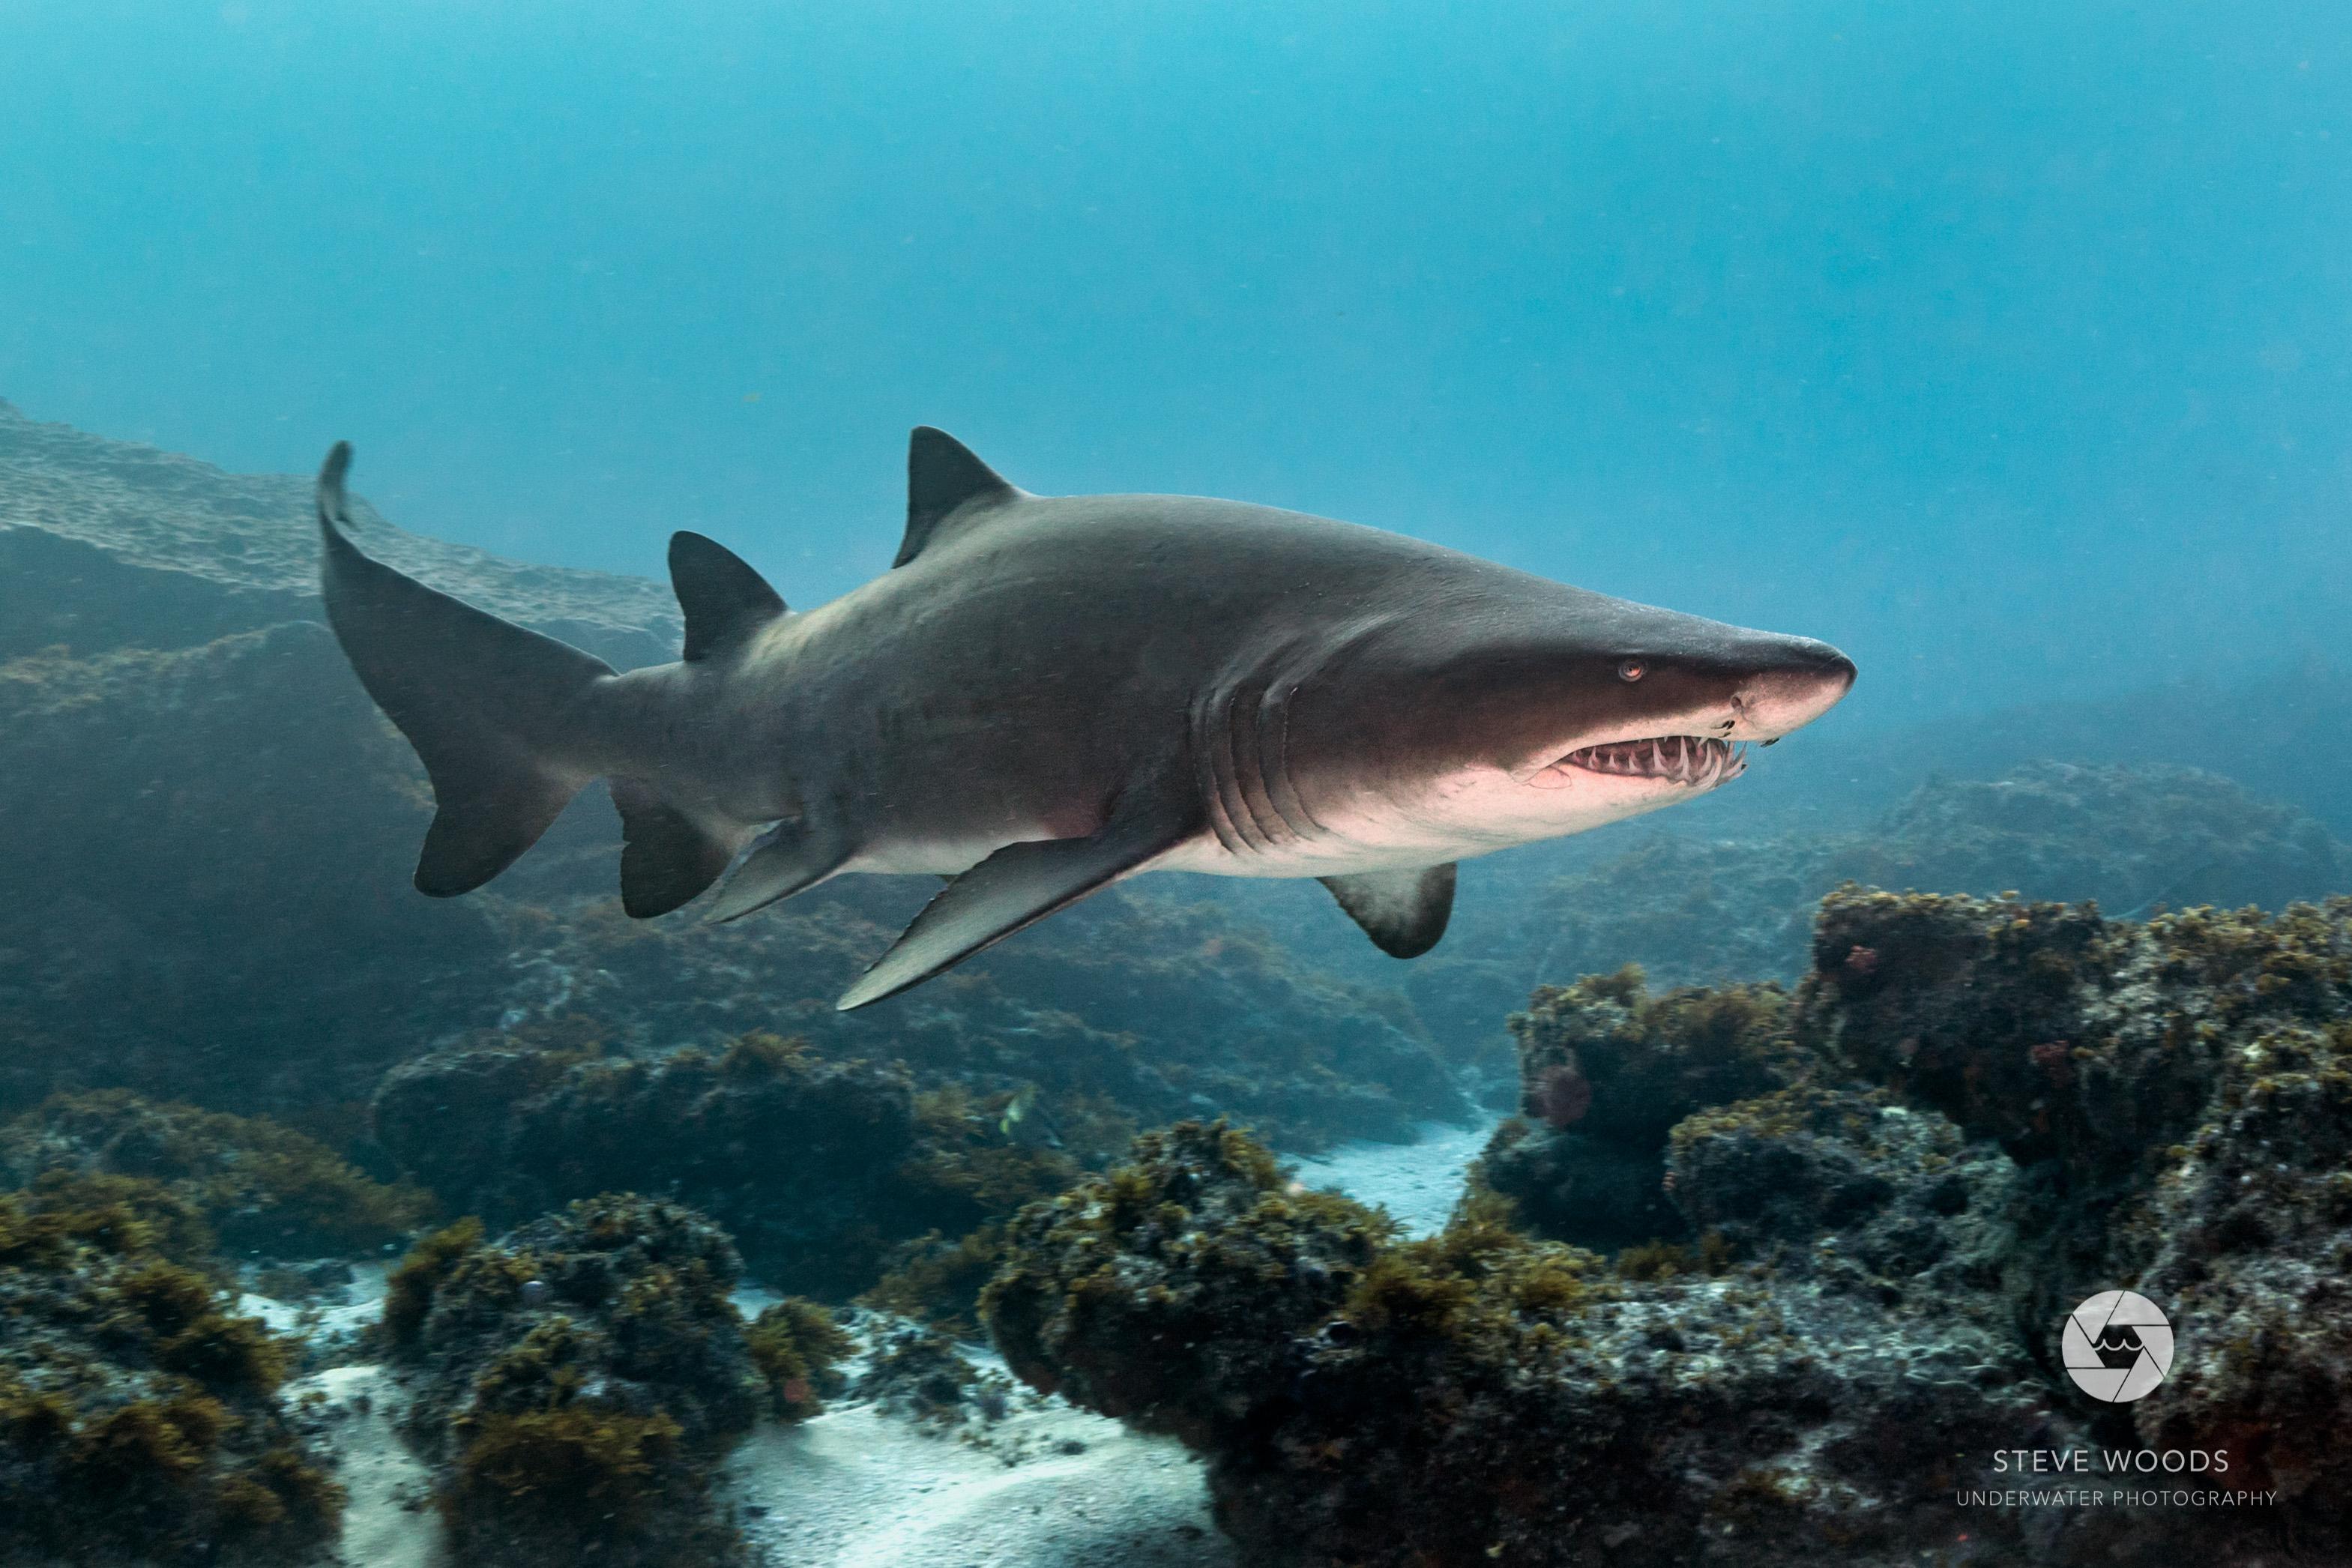 scuba diving - aliwal shoal, south africa